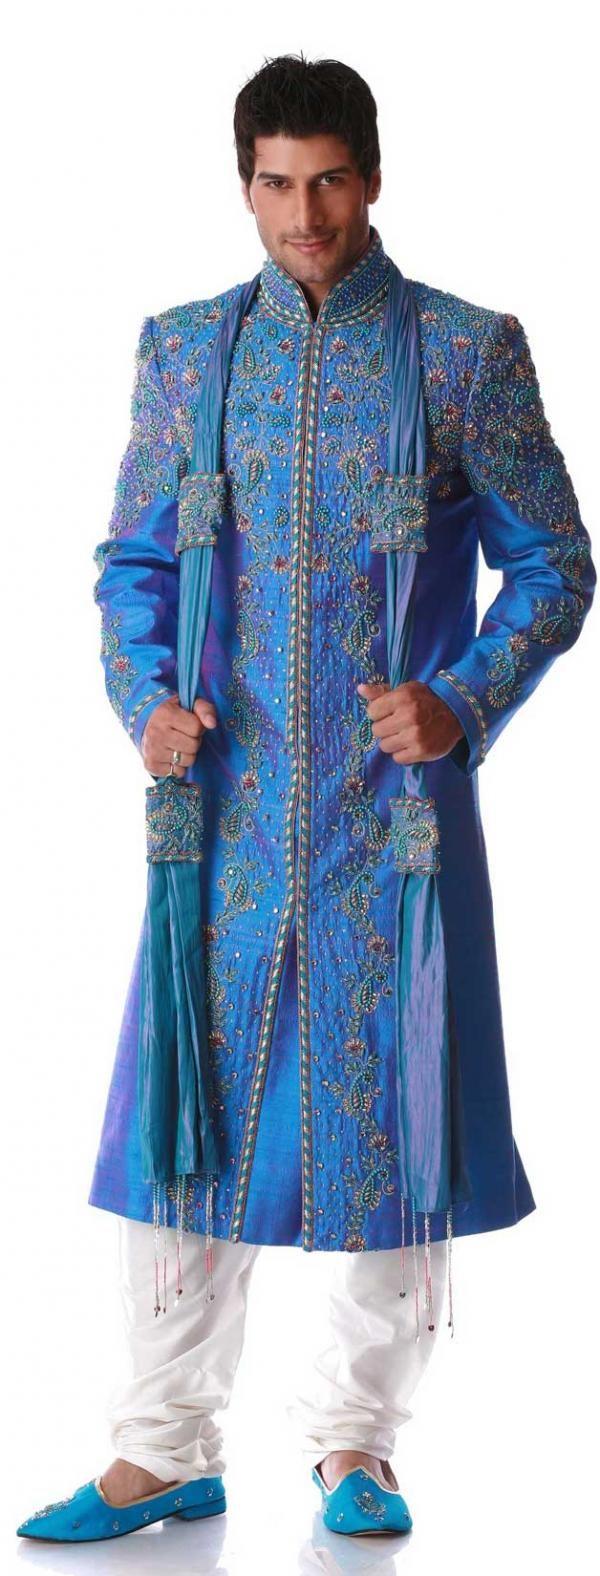 Beige Jaquard Silk Brocade Sherwani (NMK-3613) | Sherwani, Mens ...